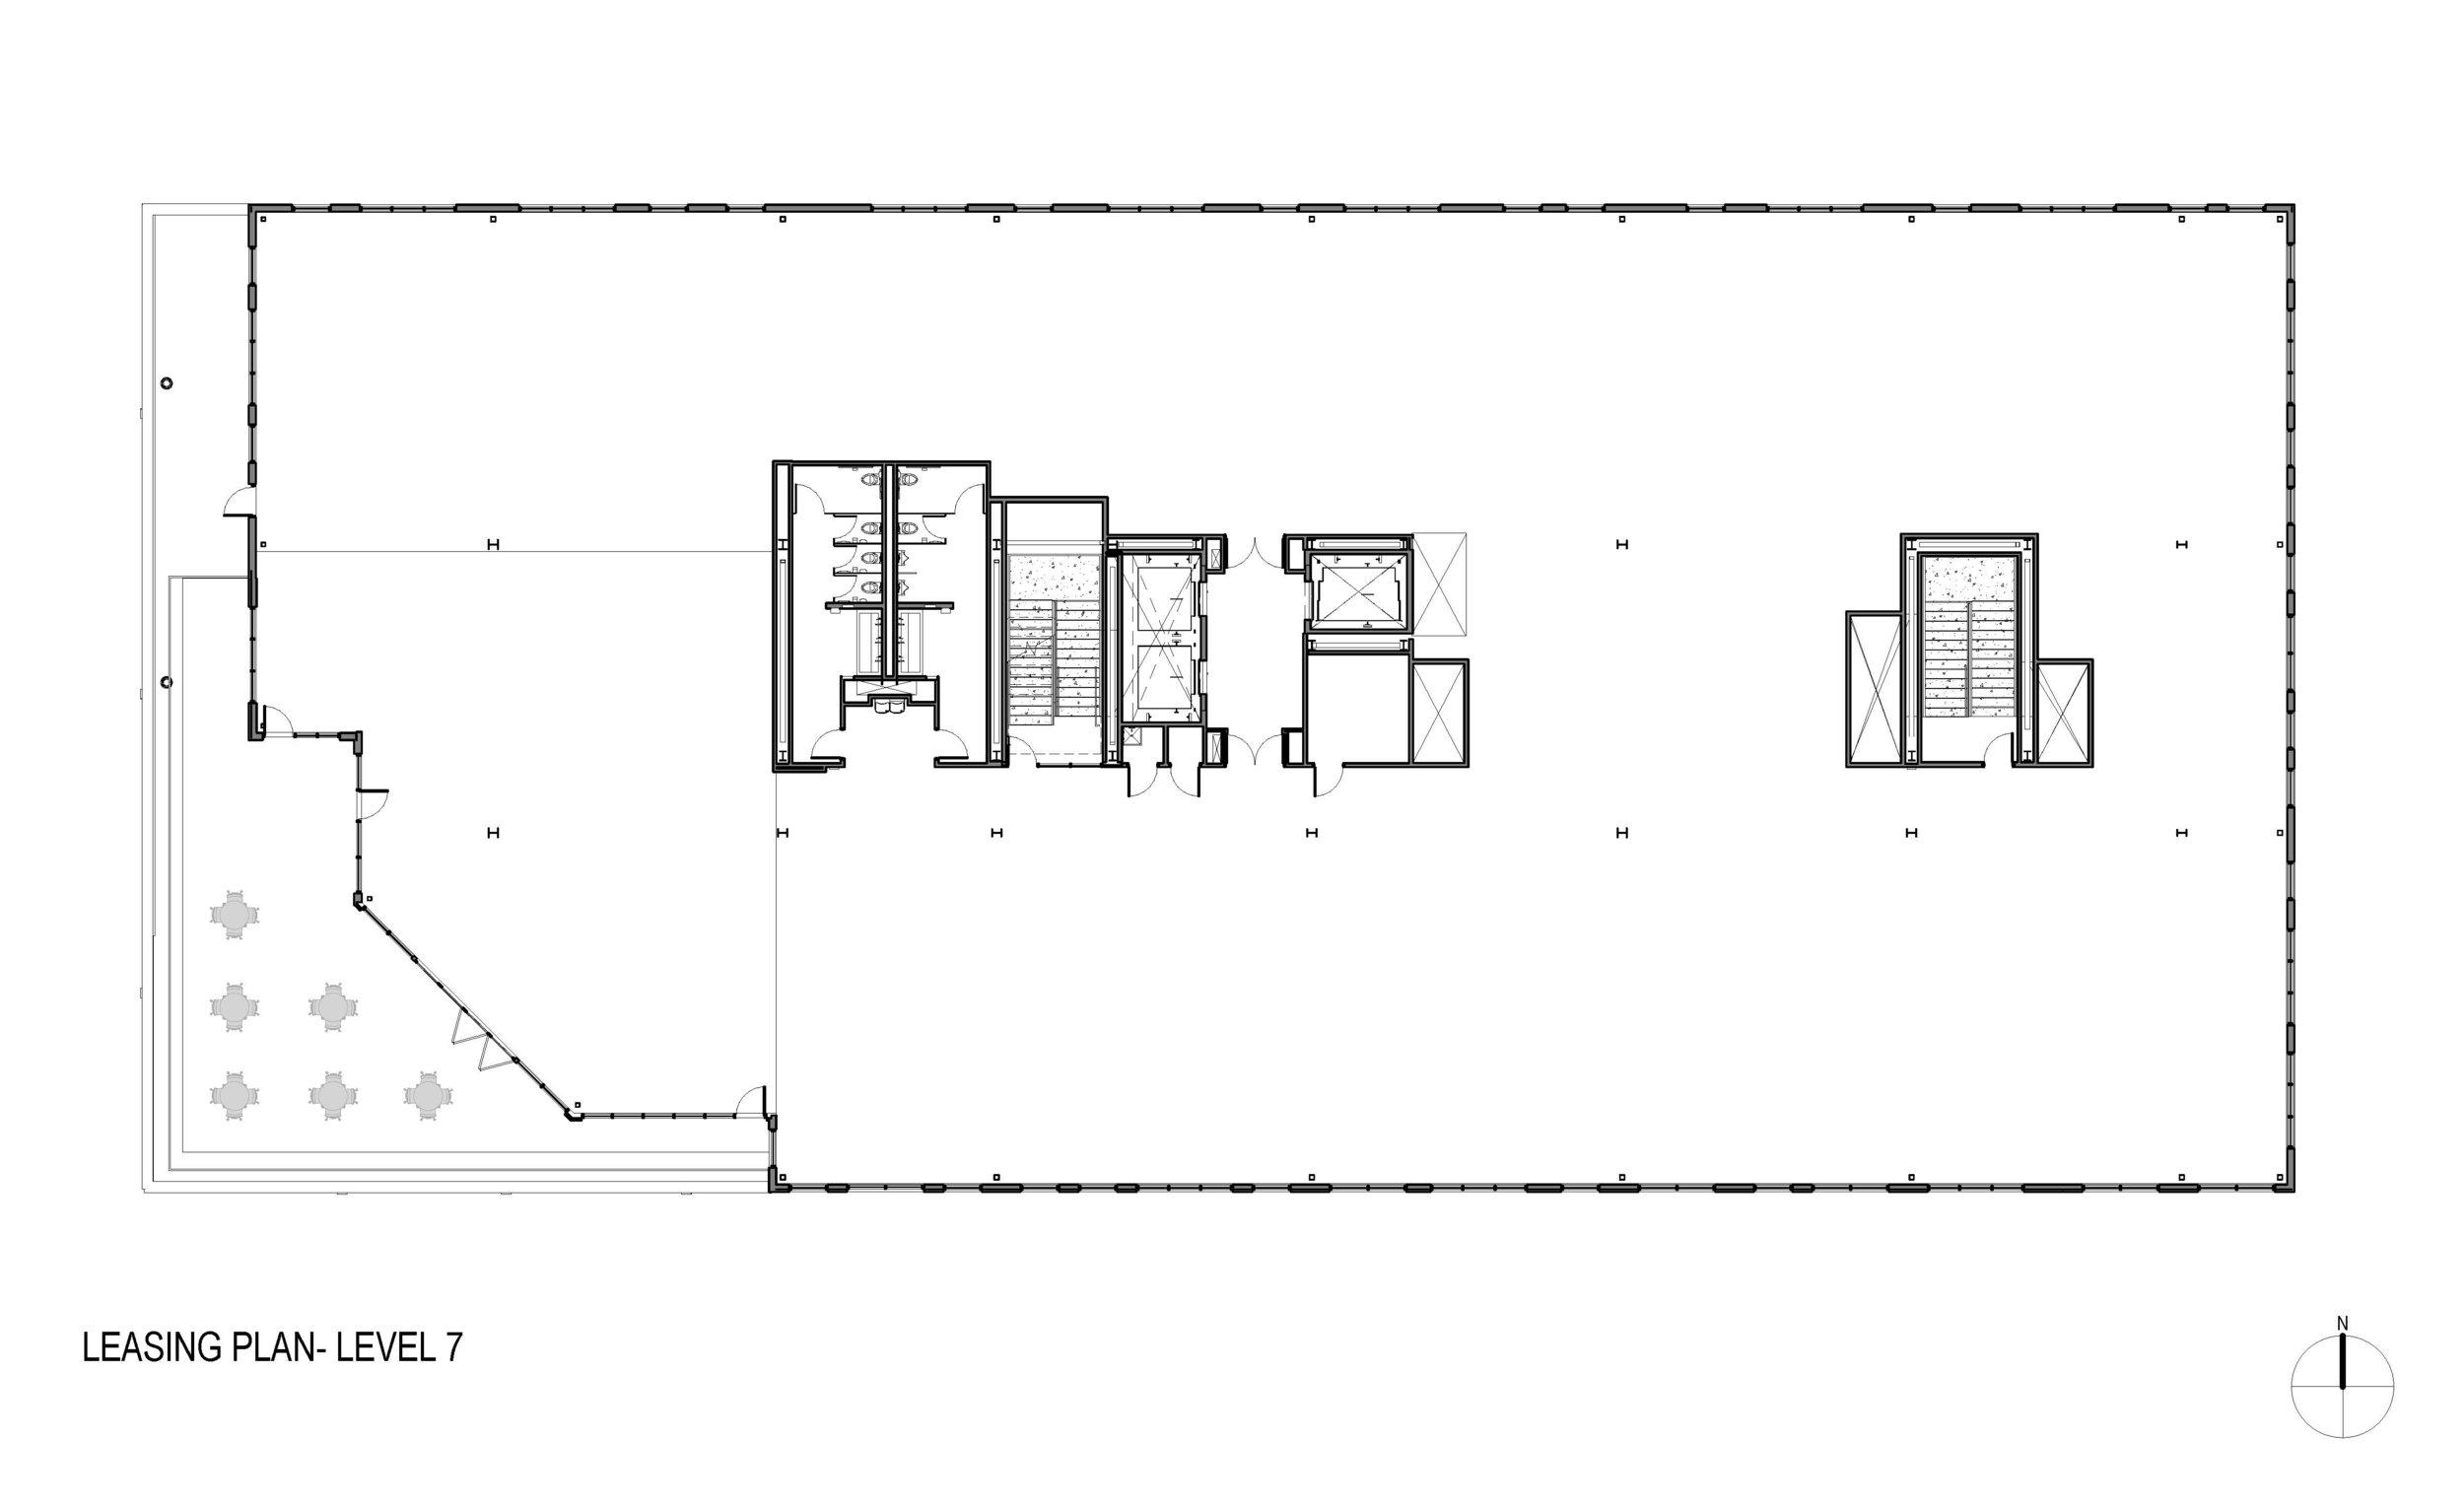 Catalyst-7th Floor Leasing Study 3.31.17.jpg